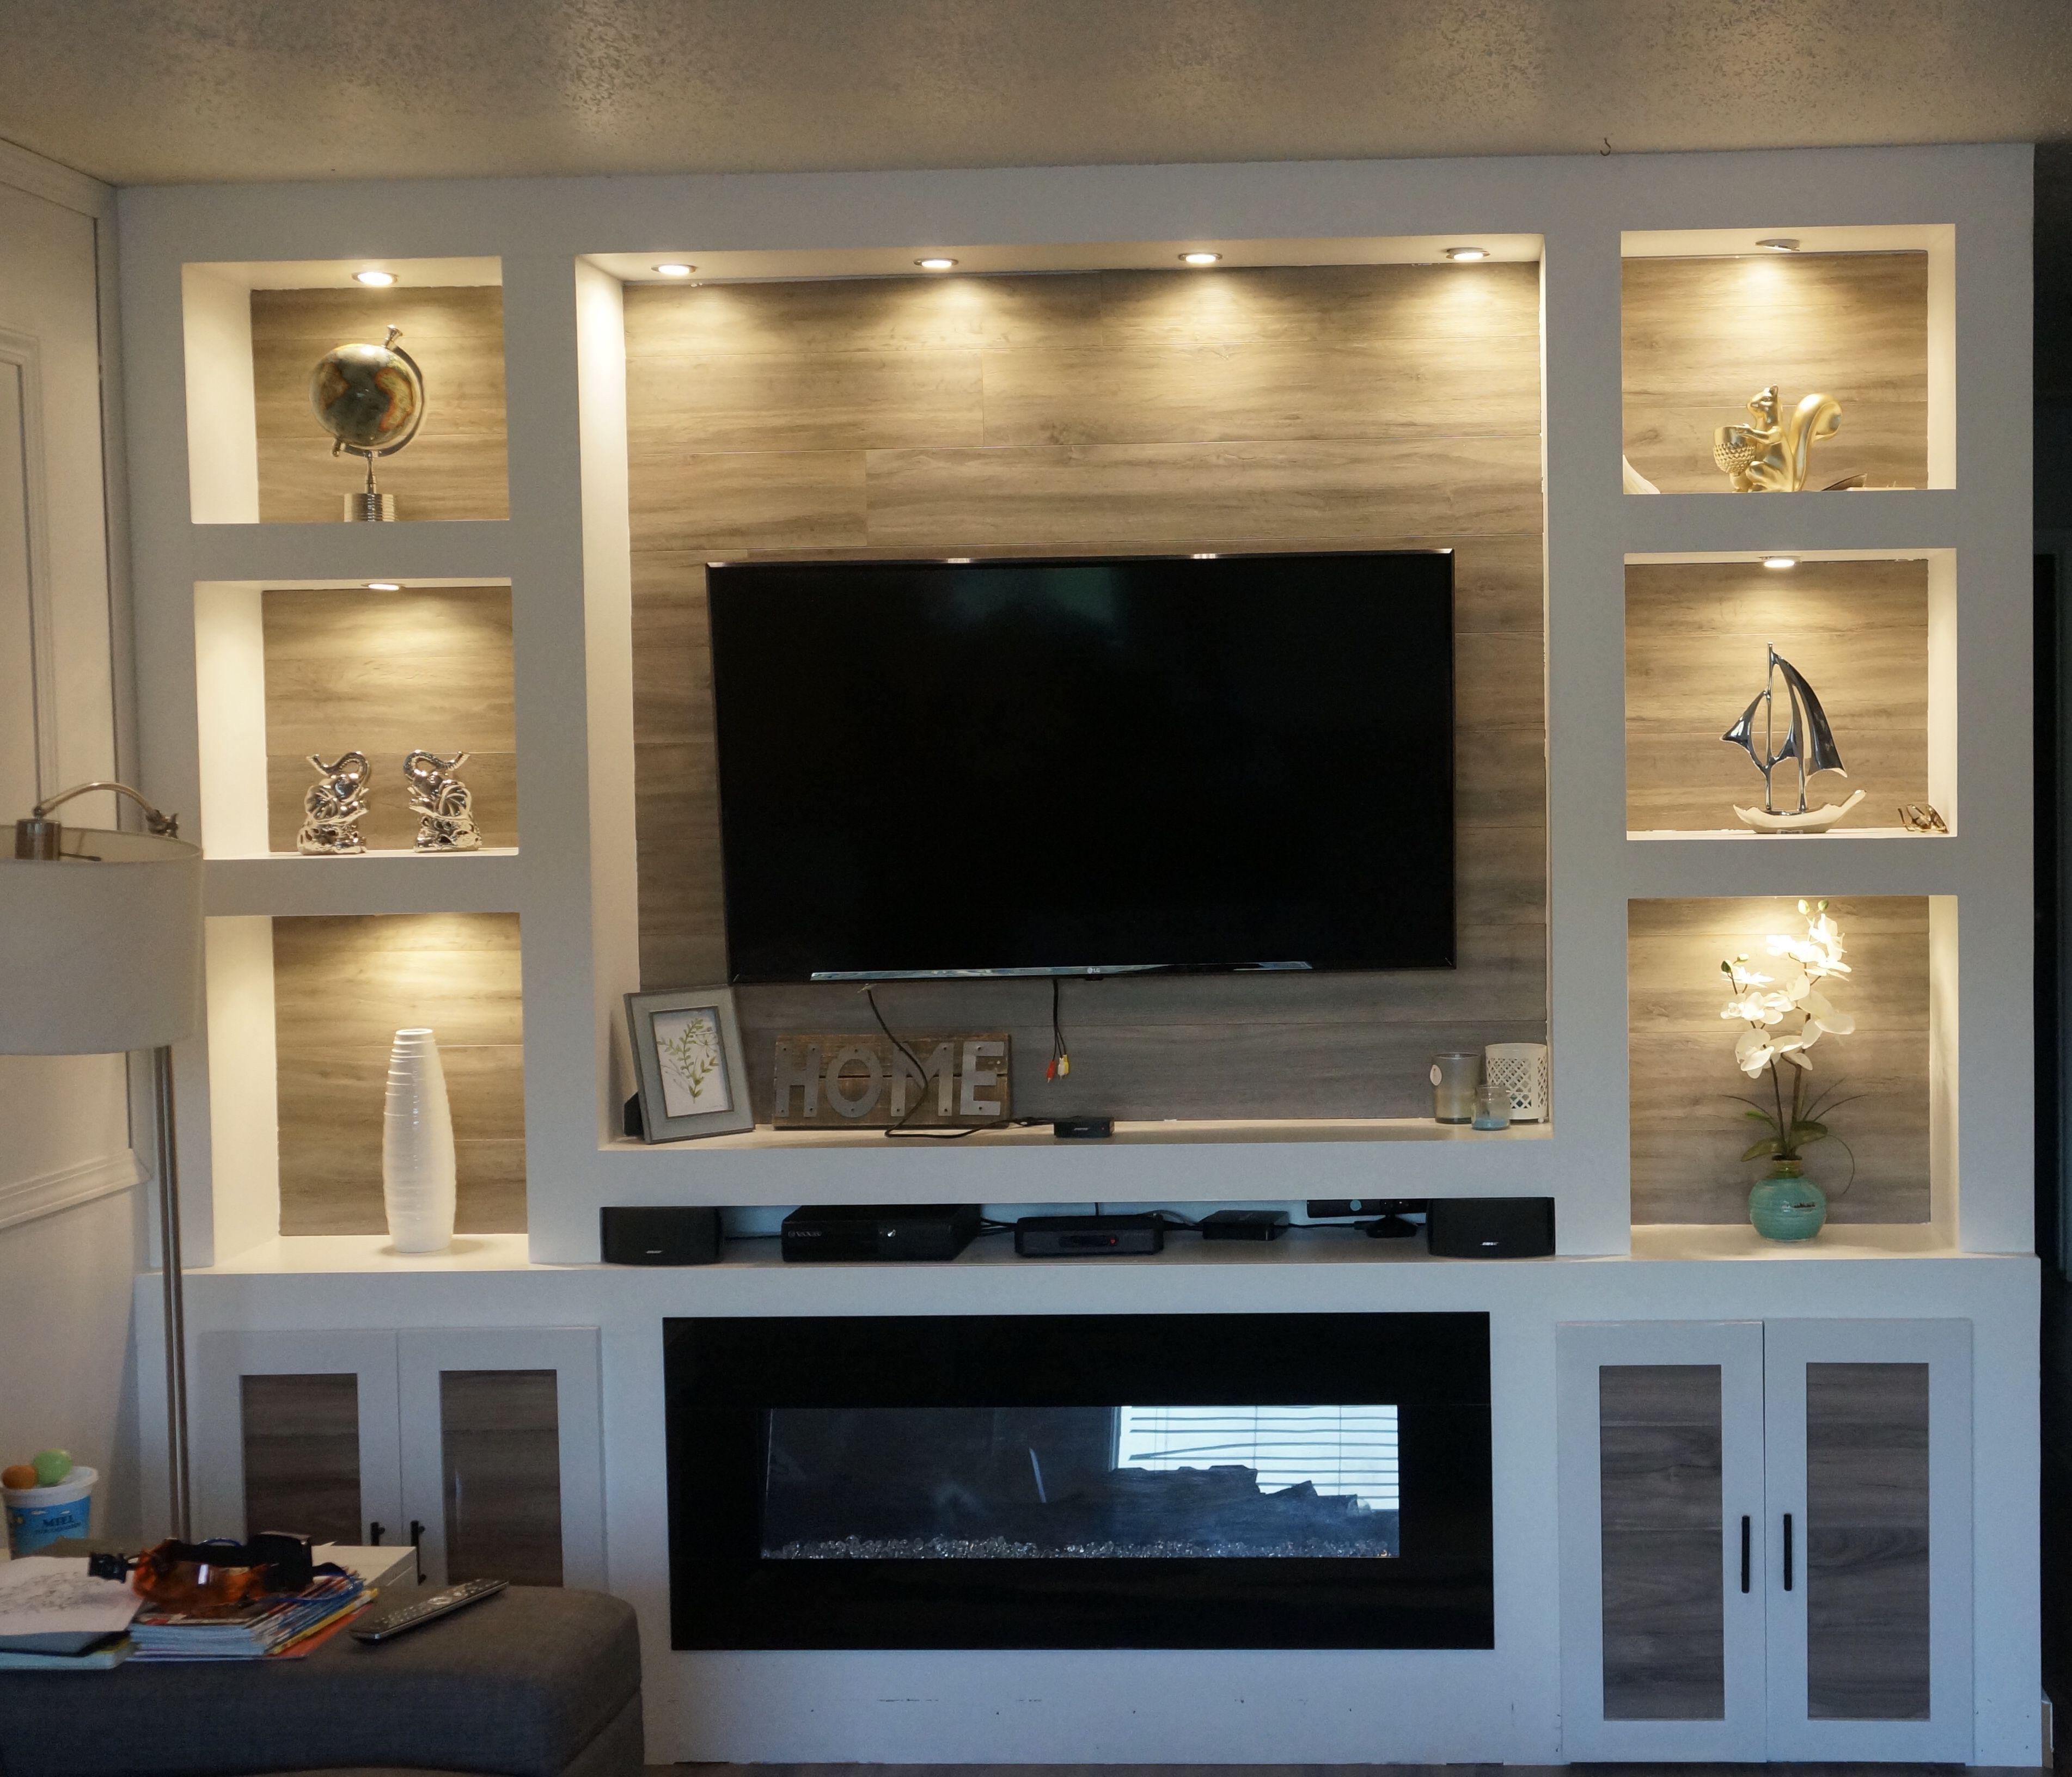 Salvabrani Interior Decorating Living Room Living Room Design Modern Feature Wall Living Room Design for living room wall